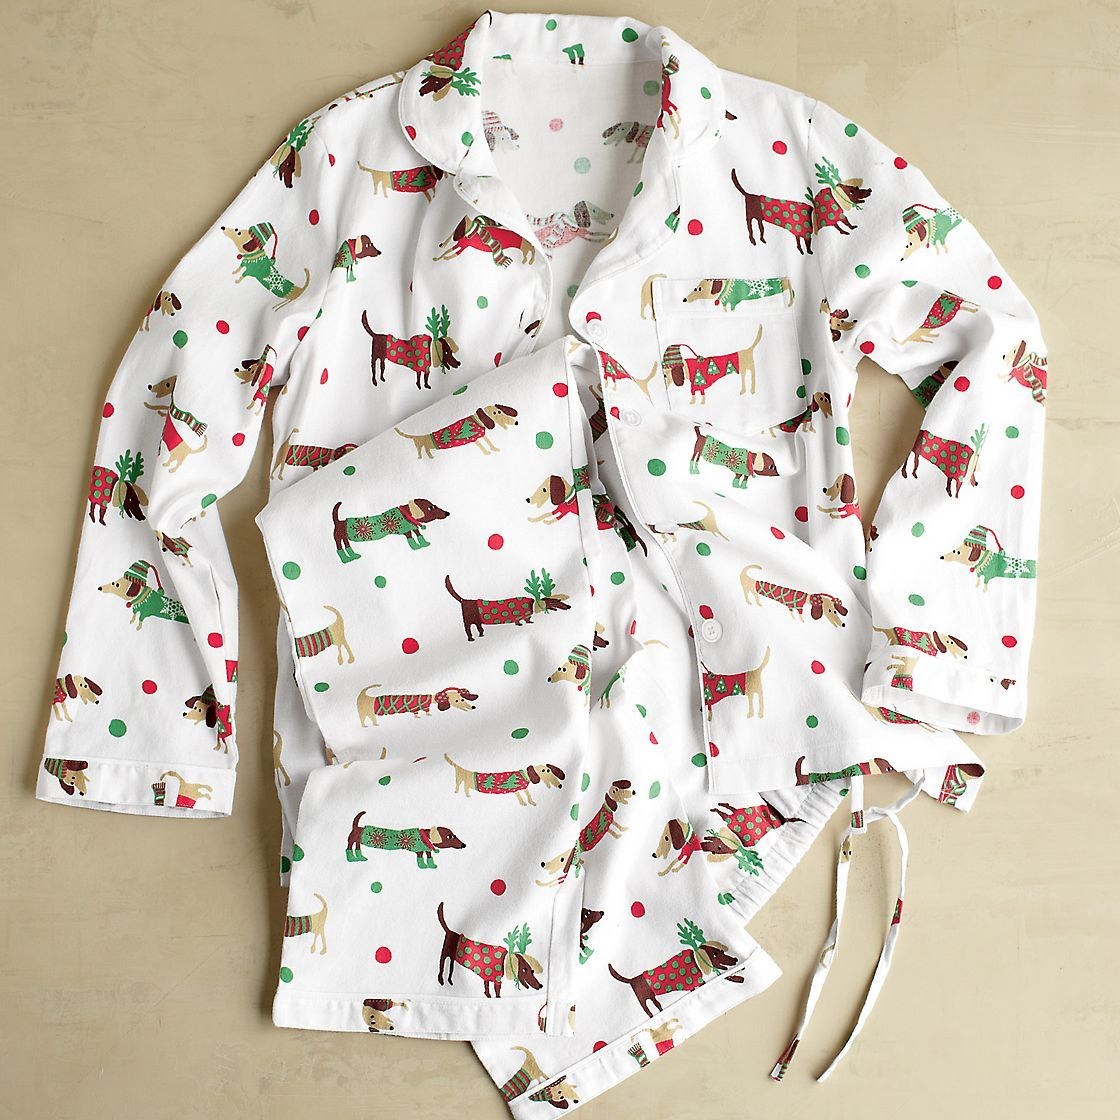 WEENIE DOG!!!! Festive Plaid Flannel Matching Family